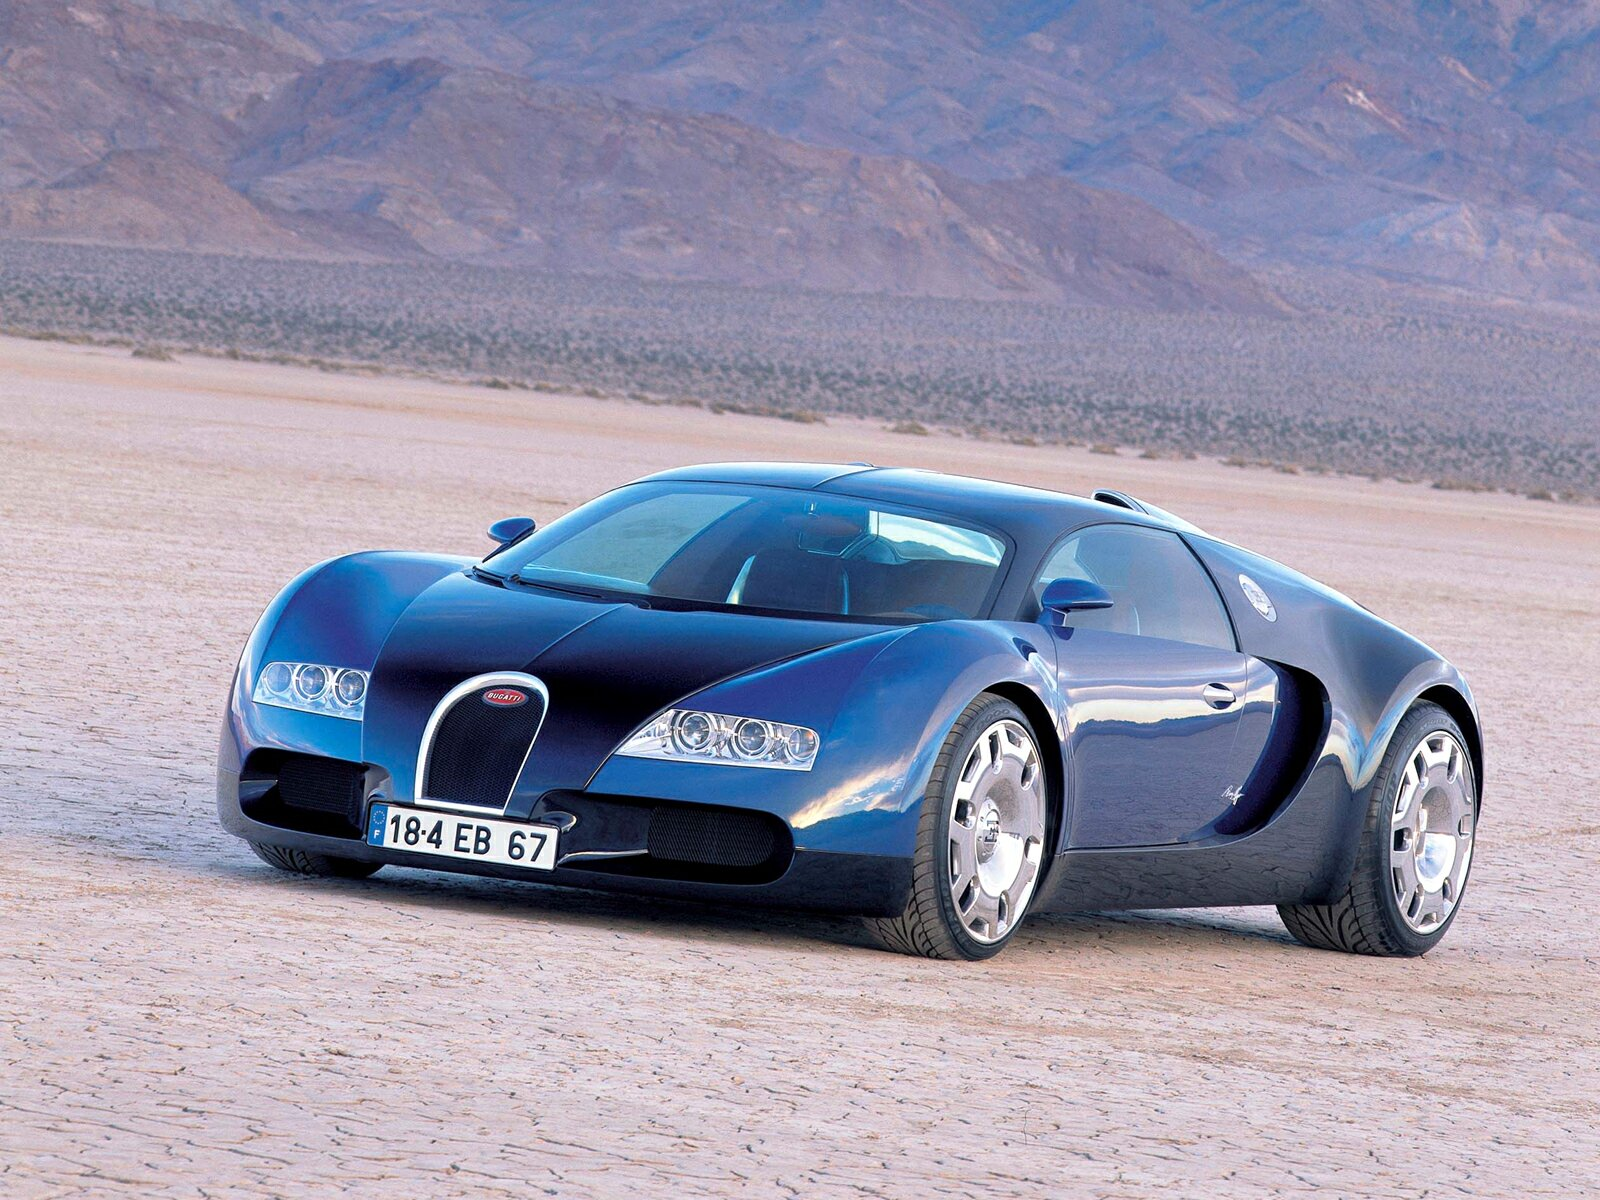 bugatti-veyron-15 Inspiring Bugatti Veyron Price Australian Dollars Cars Trend